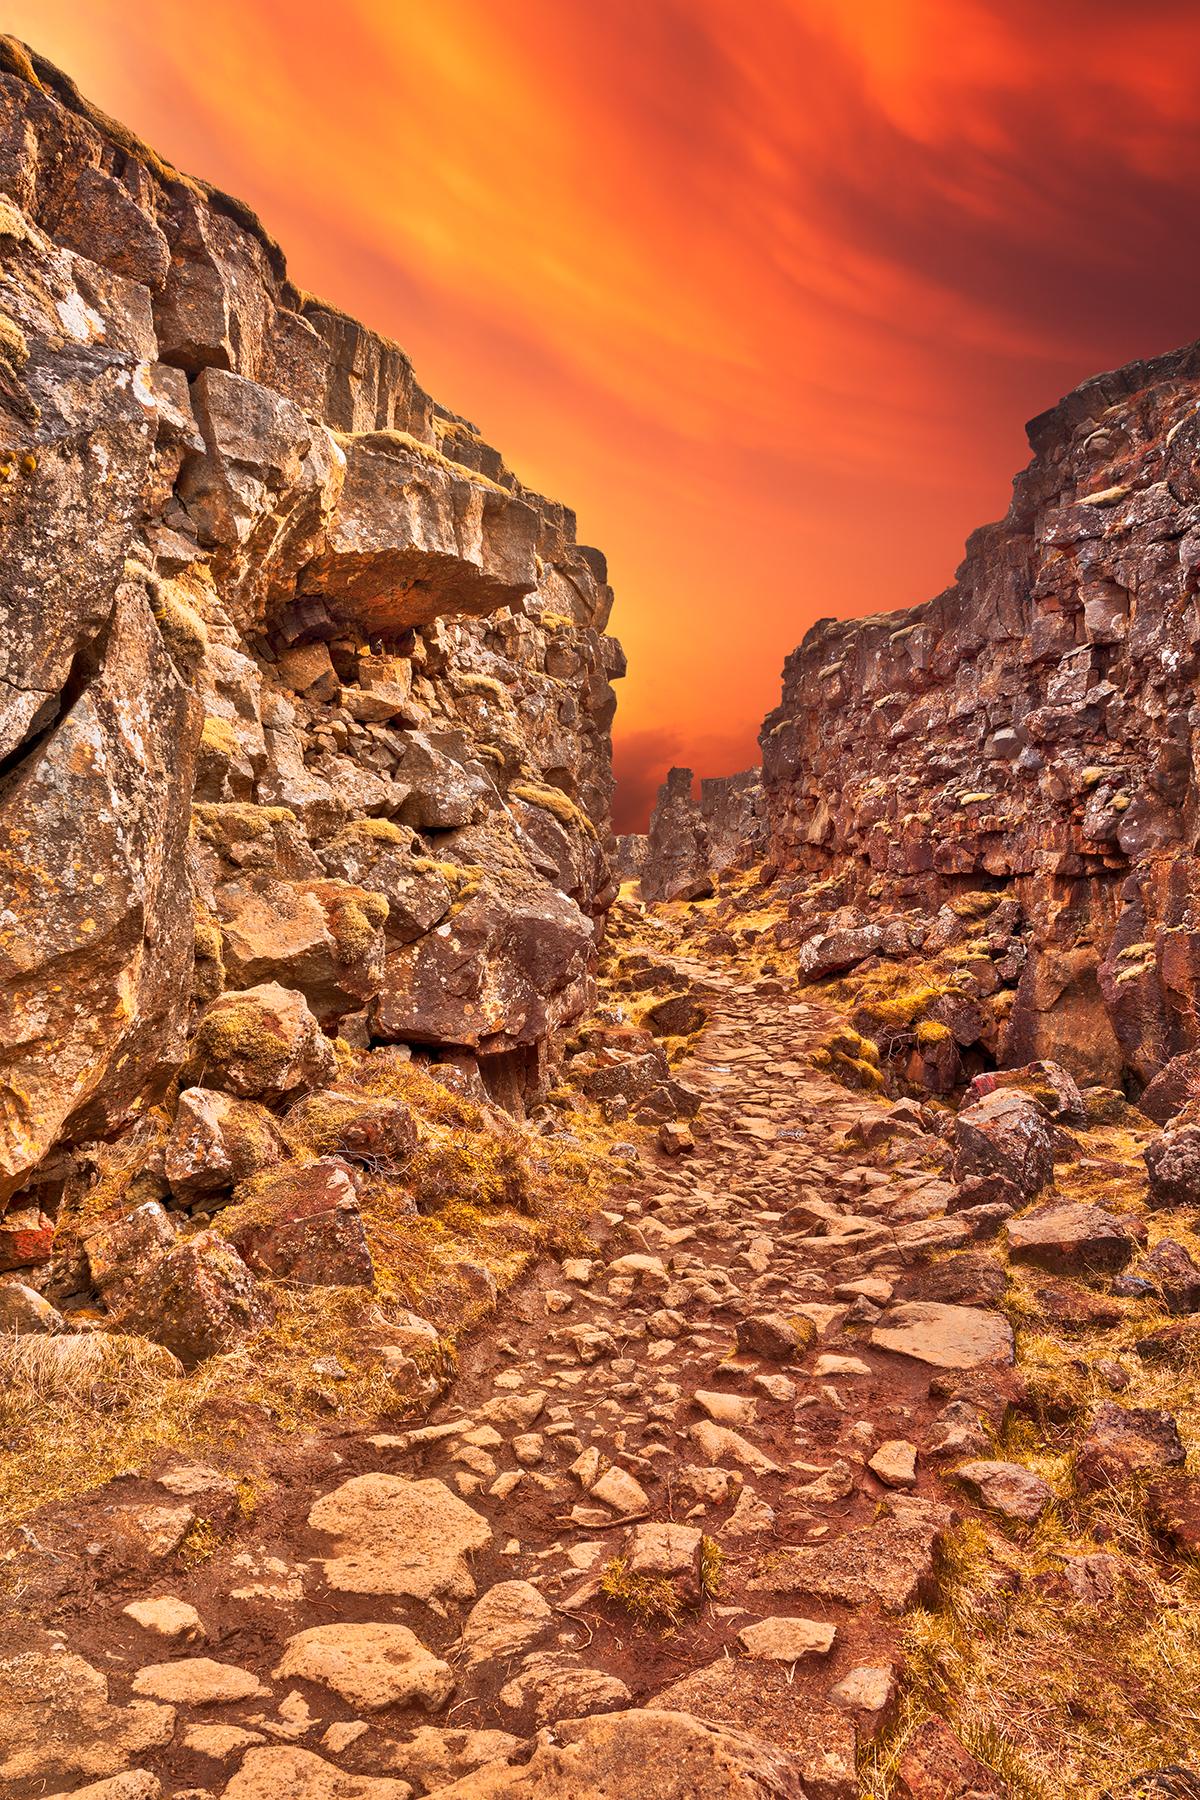 Rugged Sunset Rift Trail - Thingvellir, Atmosphere, Outdoors, Rocky, Rocks, HQ Photo